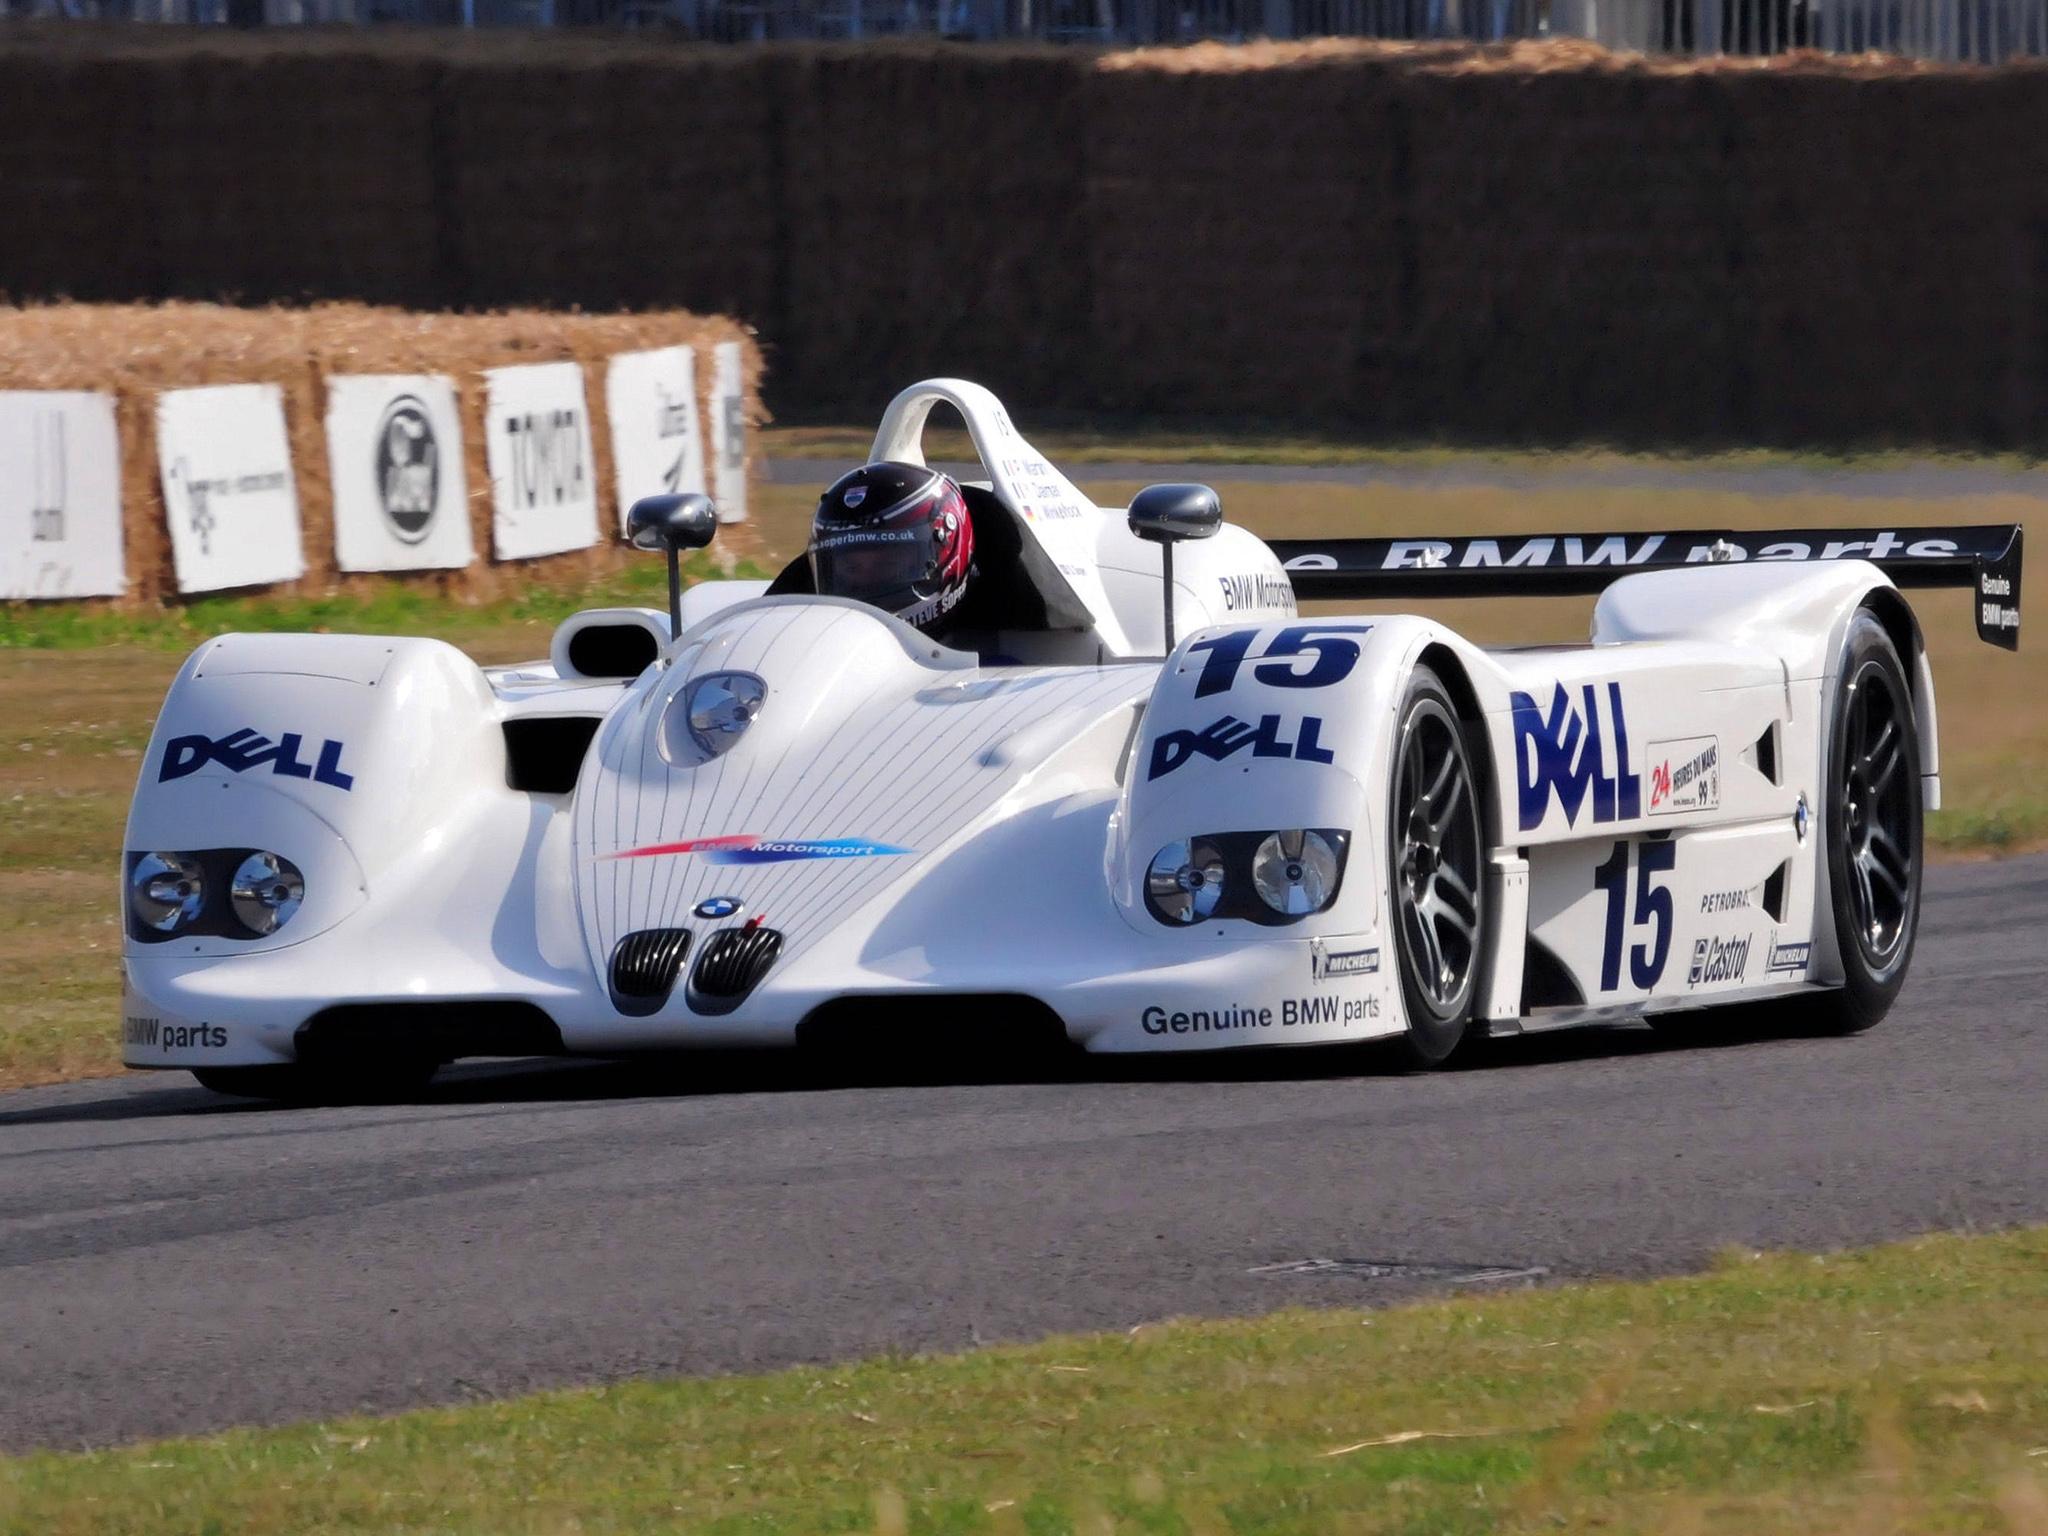 1999 Bmw V12 Lmr Le Mans Race Racing Ds Wallpaper 2048x1536 132308 Wallpaperup